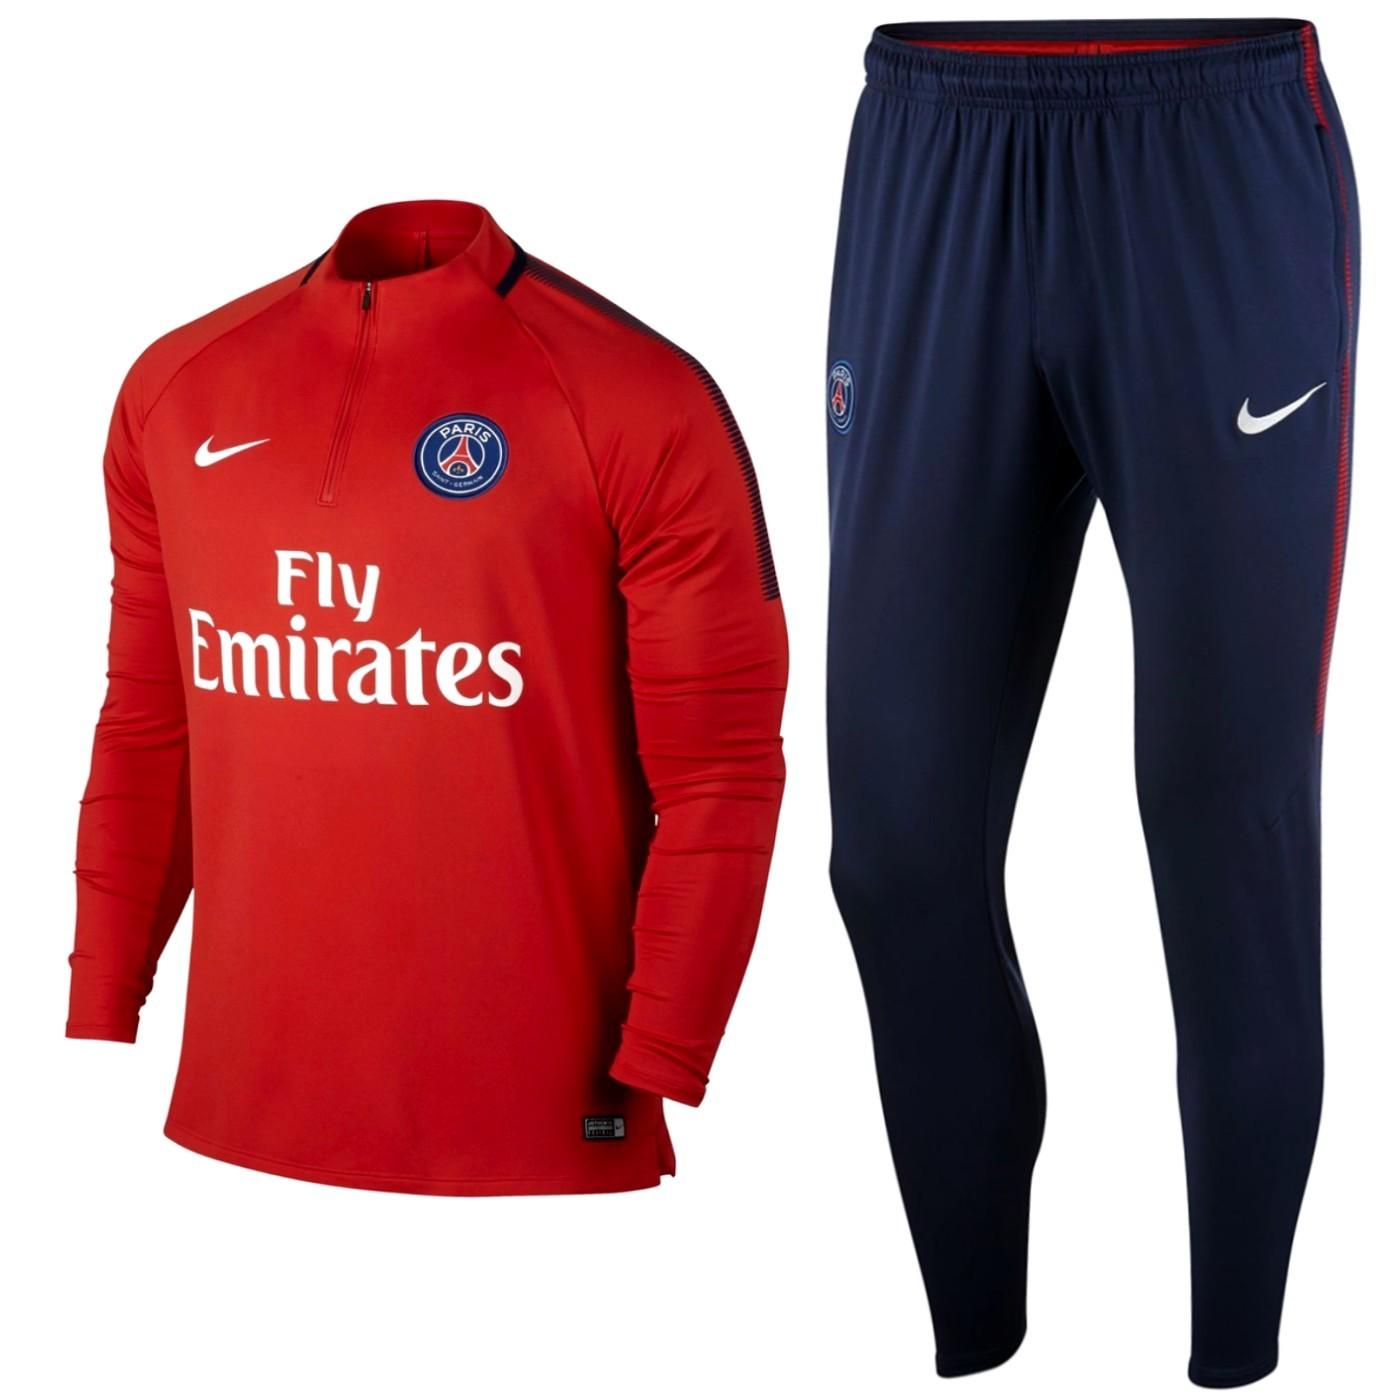 Tuta tecnica allenamento PSG Paris Saint Germain 2017/18 - Nike ...